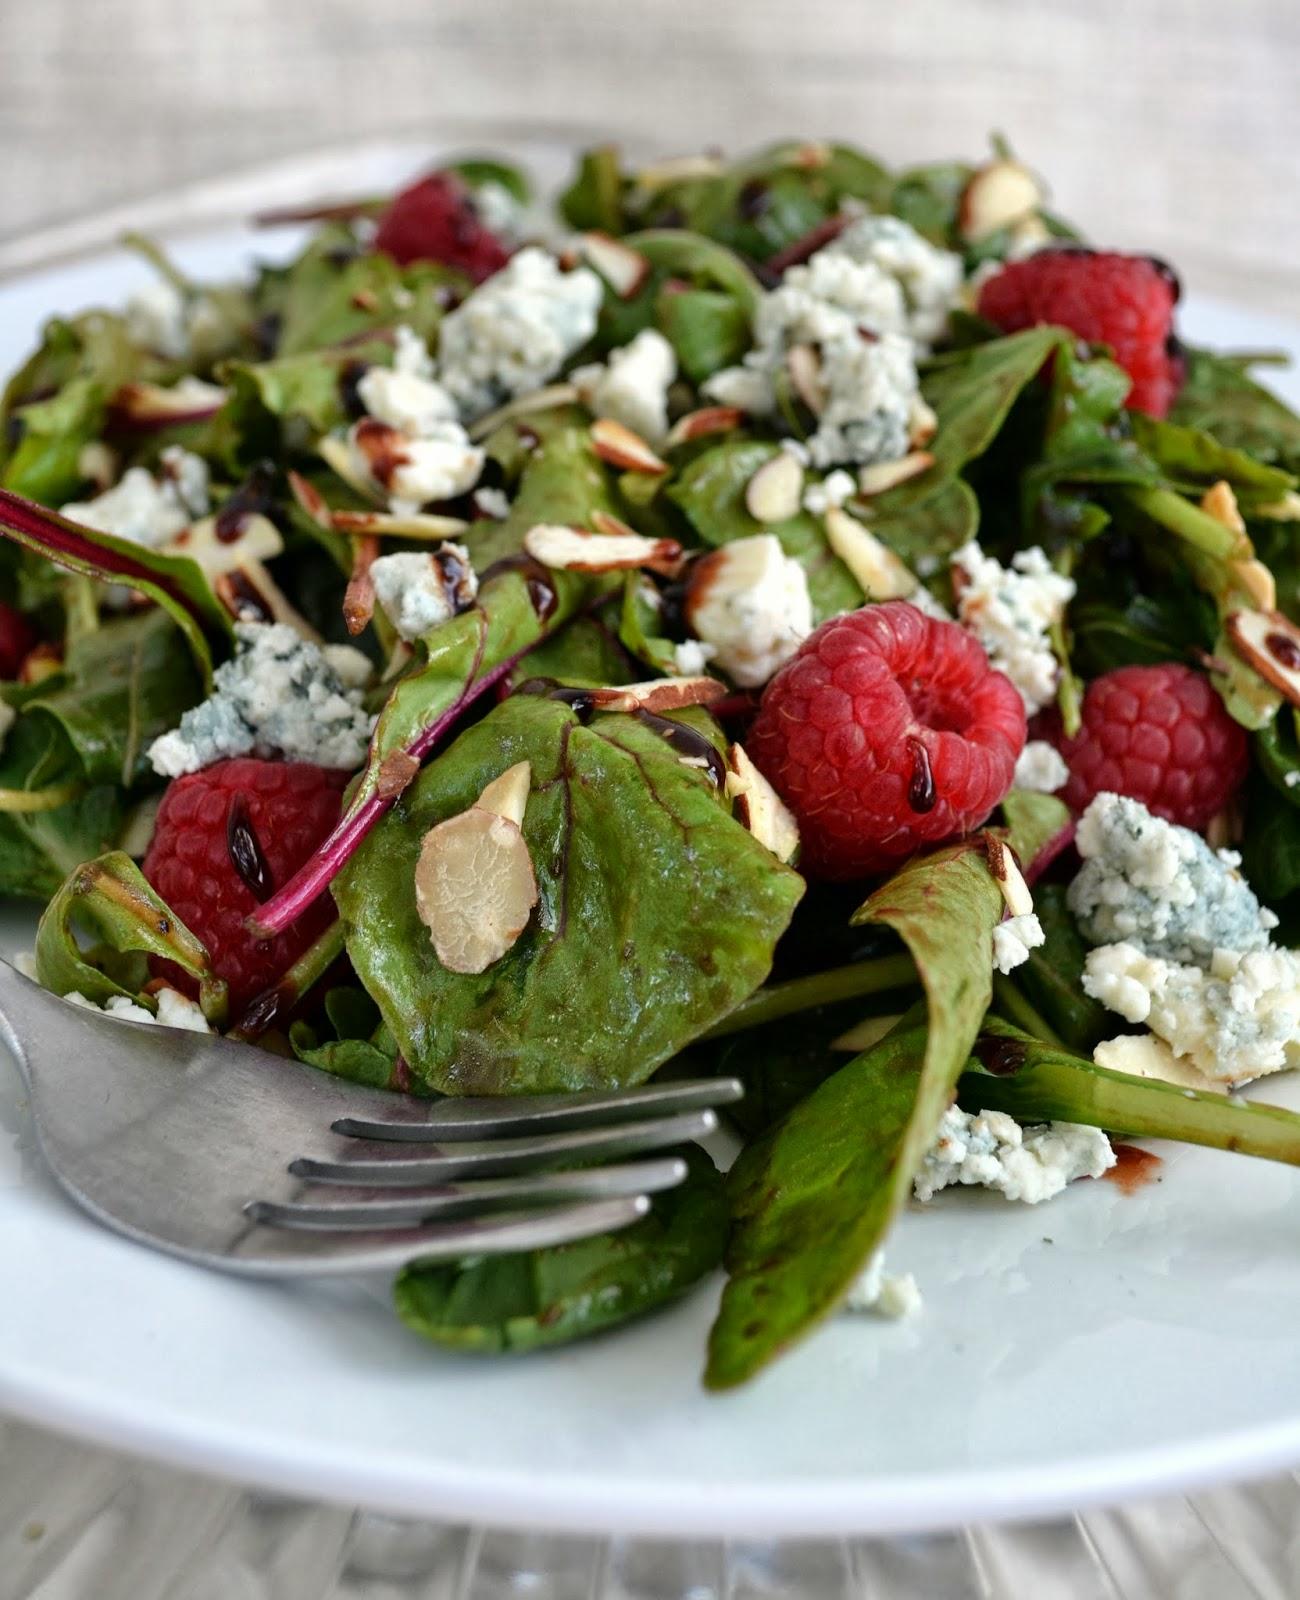 Jennuine by rook no 17 recipe homemade raspberry balsamic vinegar salad a heart healthy - Homemade vinegar recipes ...